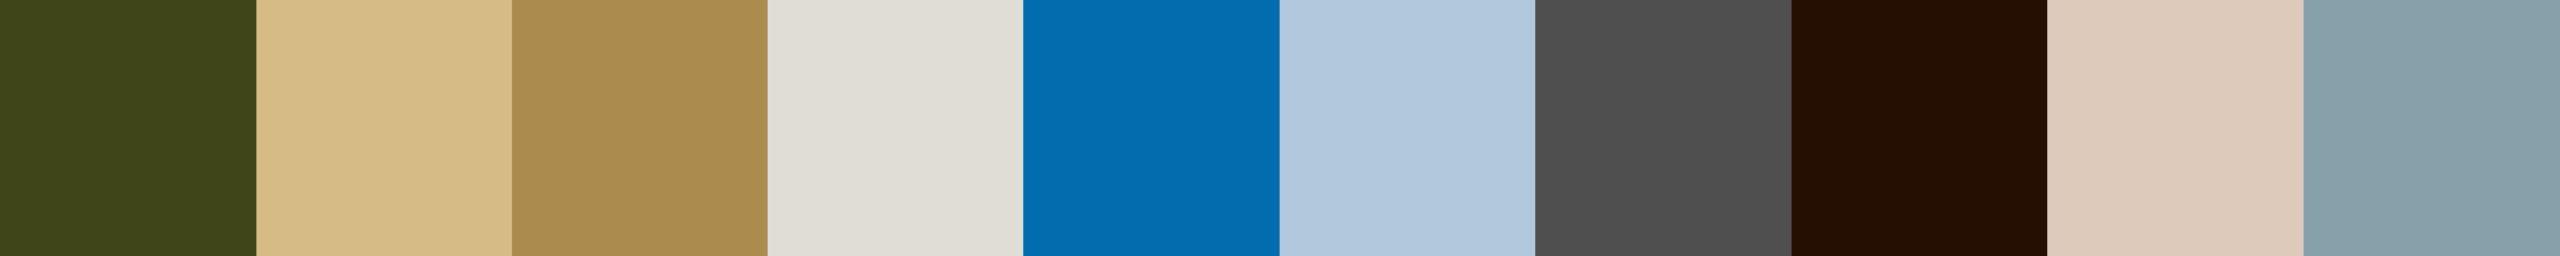 461 Ciovajela Color Palette